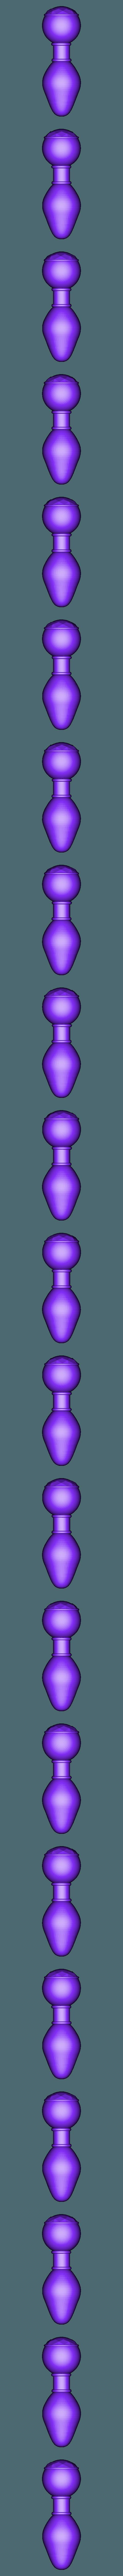 Rosebud XL v2.STL Download STL file PLUG ANAL XL • Model to 3D print, 3dprintcreation